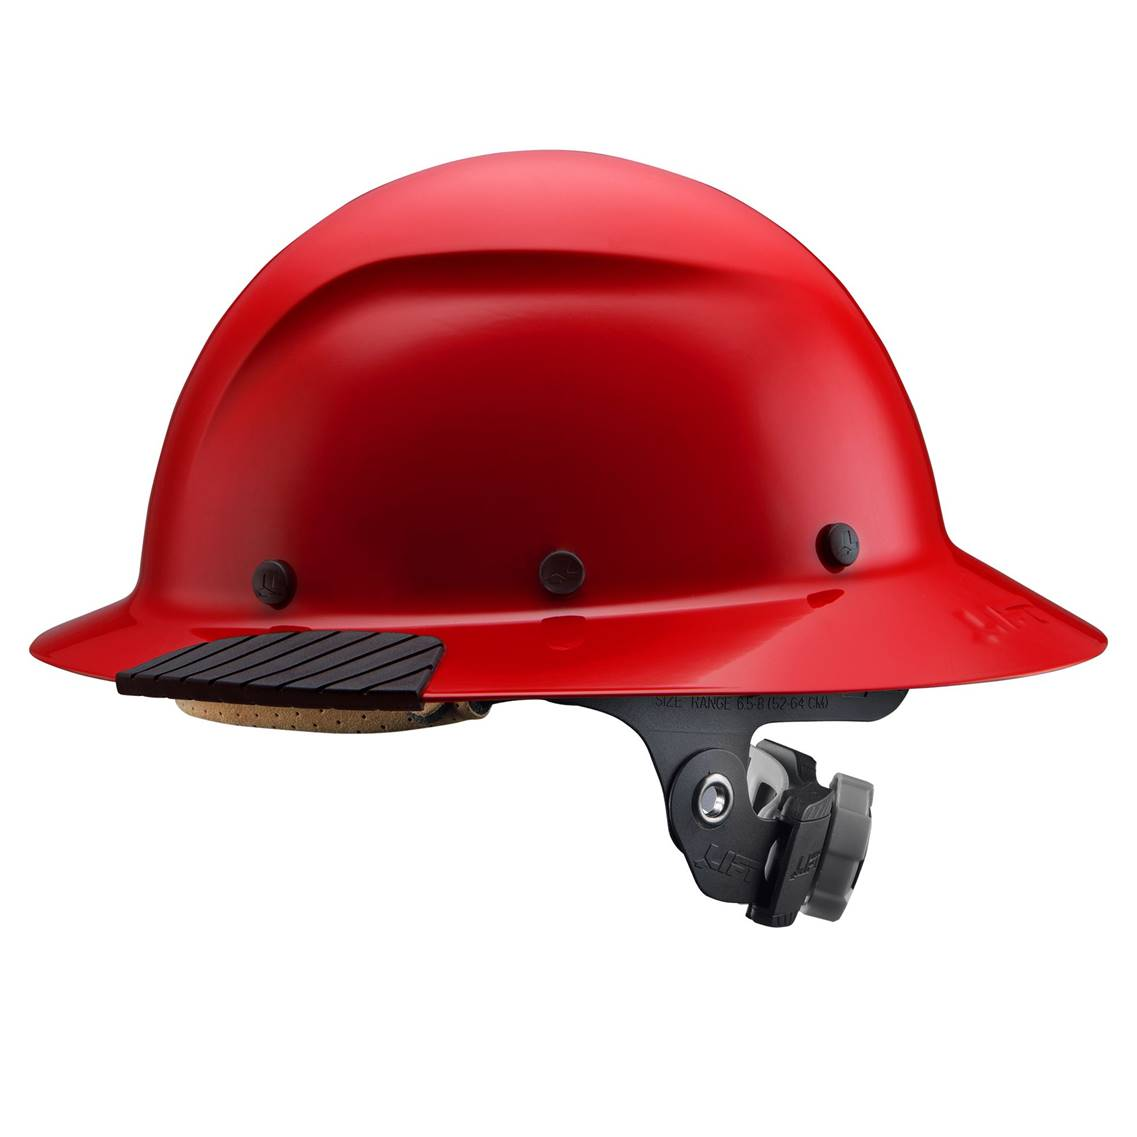 Lift Safety Hdf 20rg Dax Red Full Brim Hard Hat W Ratchet Suspension Walmart Com Walmart Com